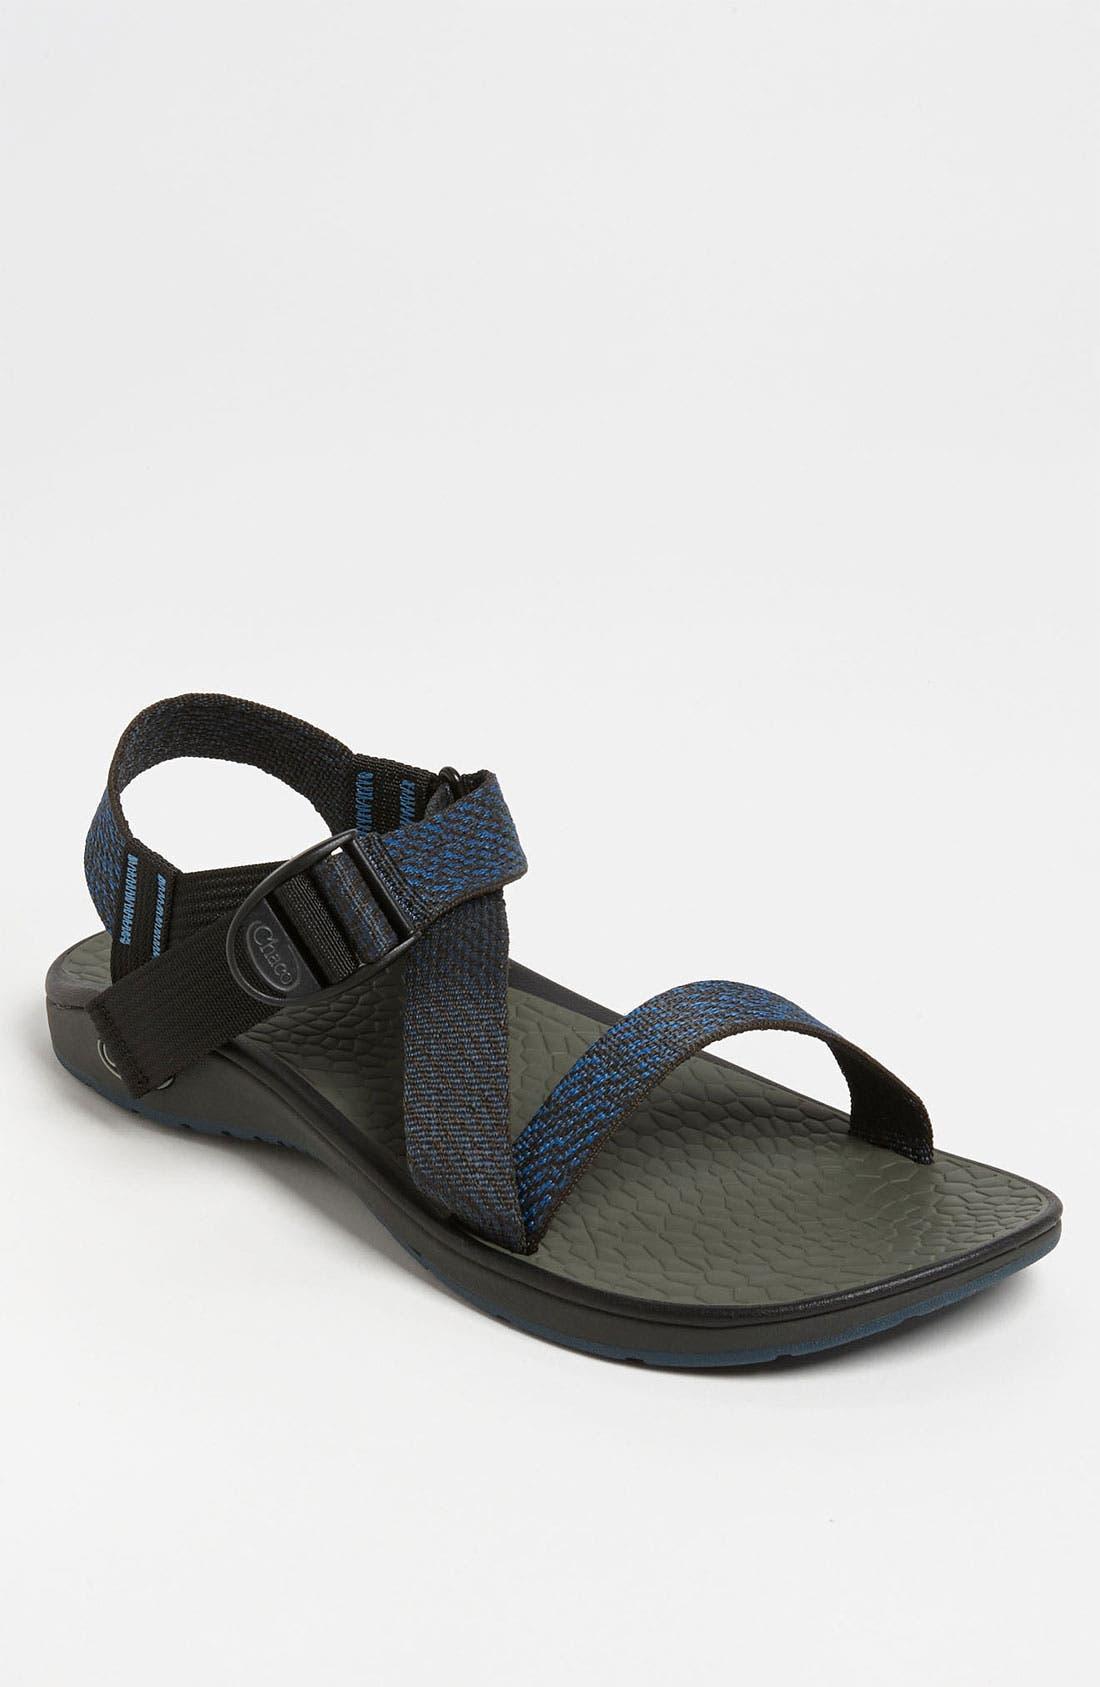 Main Image - Chaco 'Mighty' Sandal